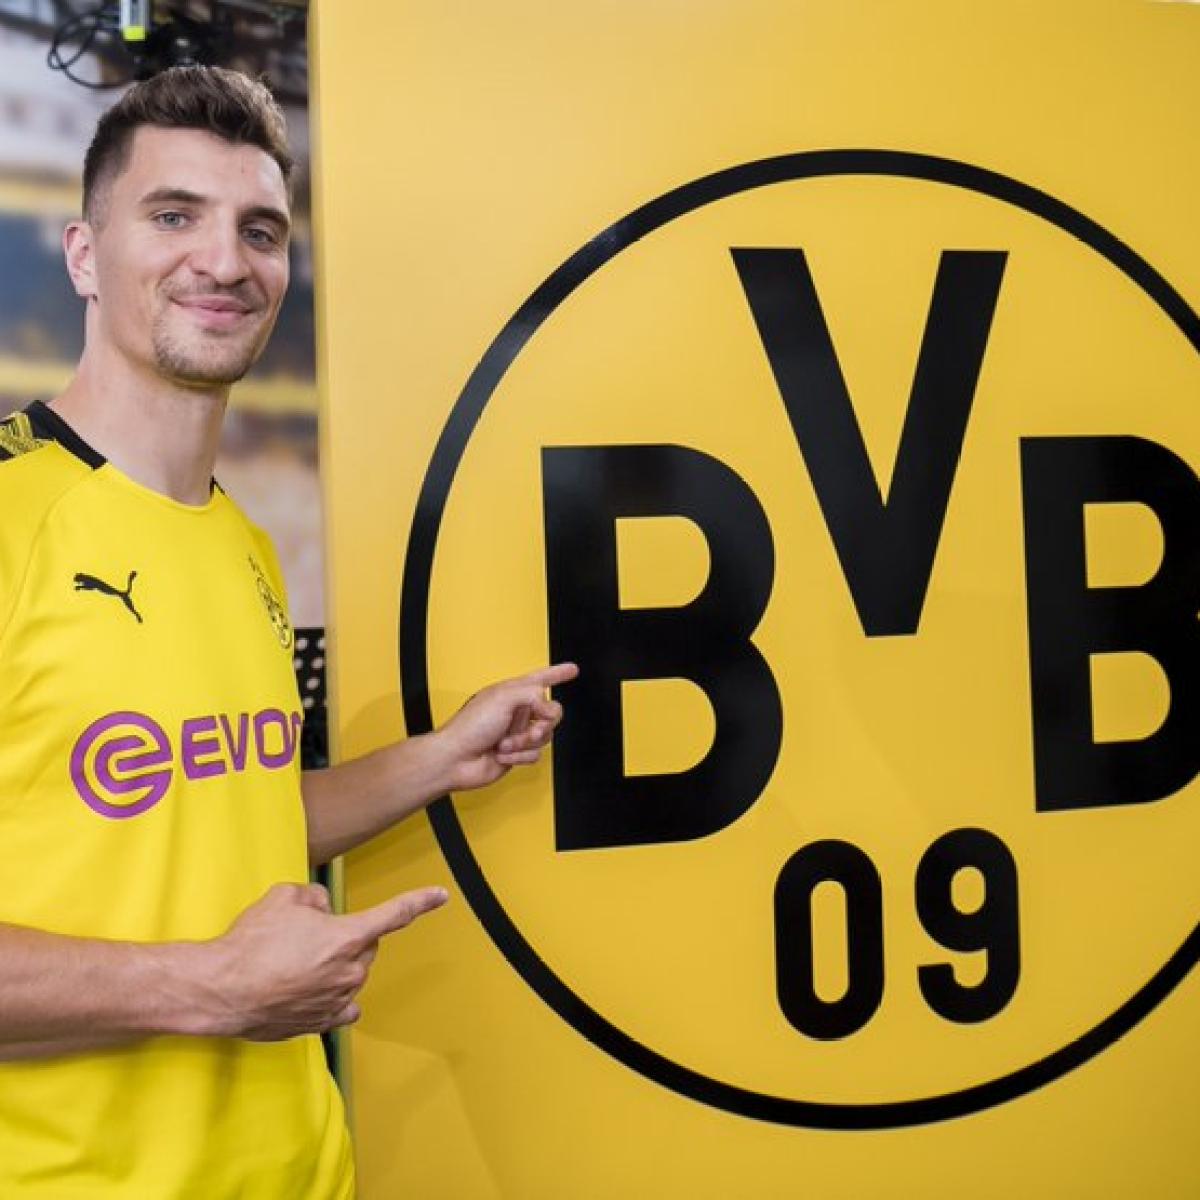 Borussia Dortmund signs right back Thomas Meunier from PSG